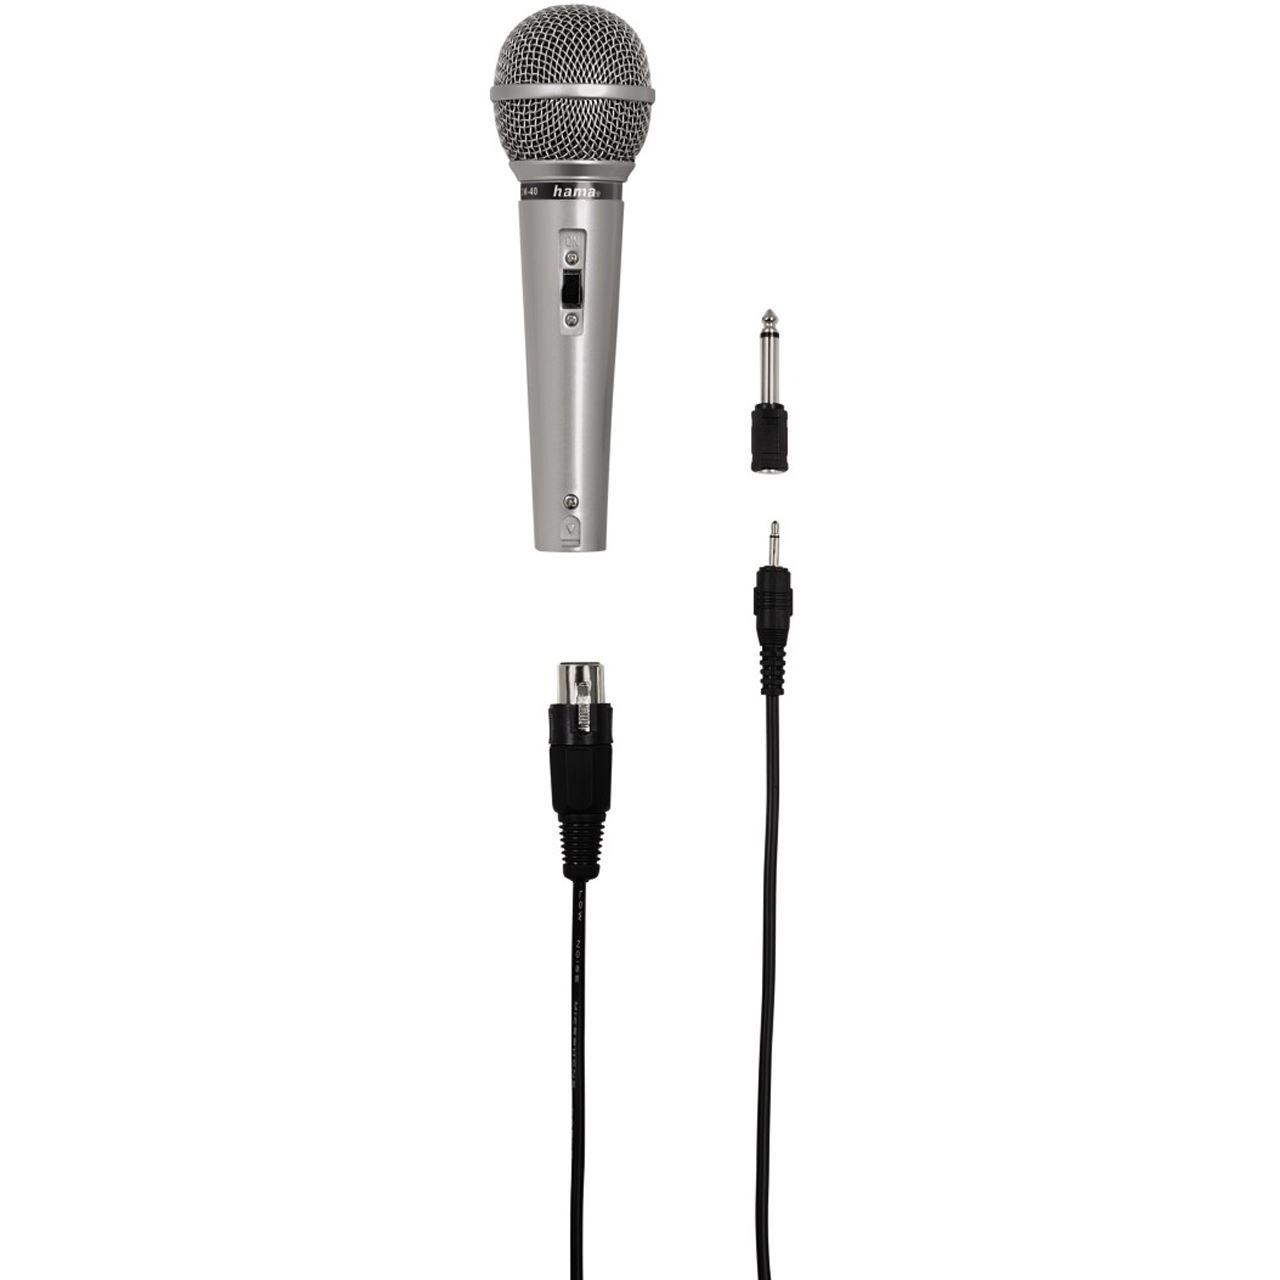 hama dm 40 3 5 mm klinke mikrofon mikrofone. Black Bedroom Furniture Sets. Home Design Ideas